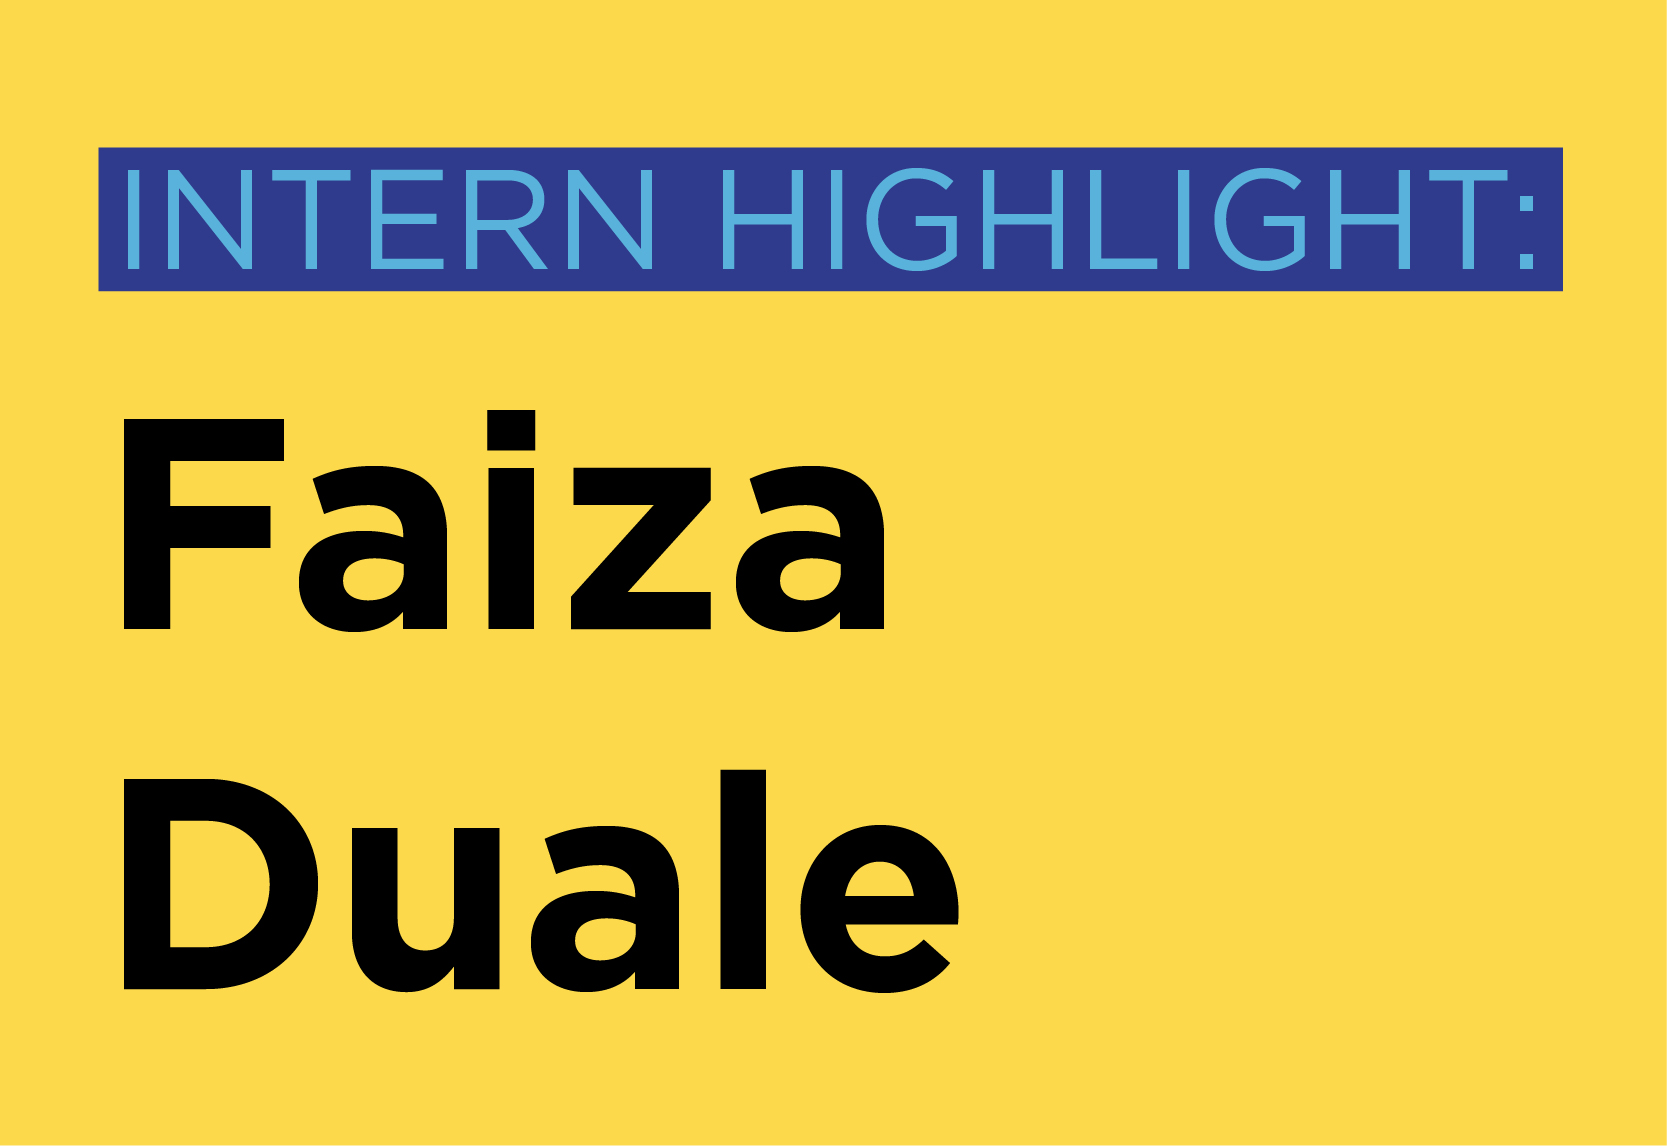 Faiza Duale, Winter/Spring 2019 Intern